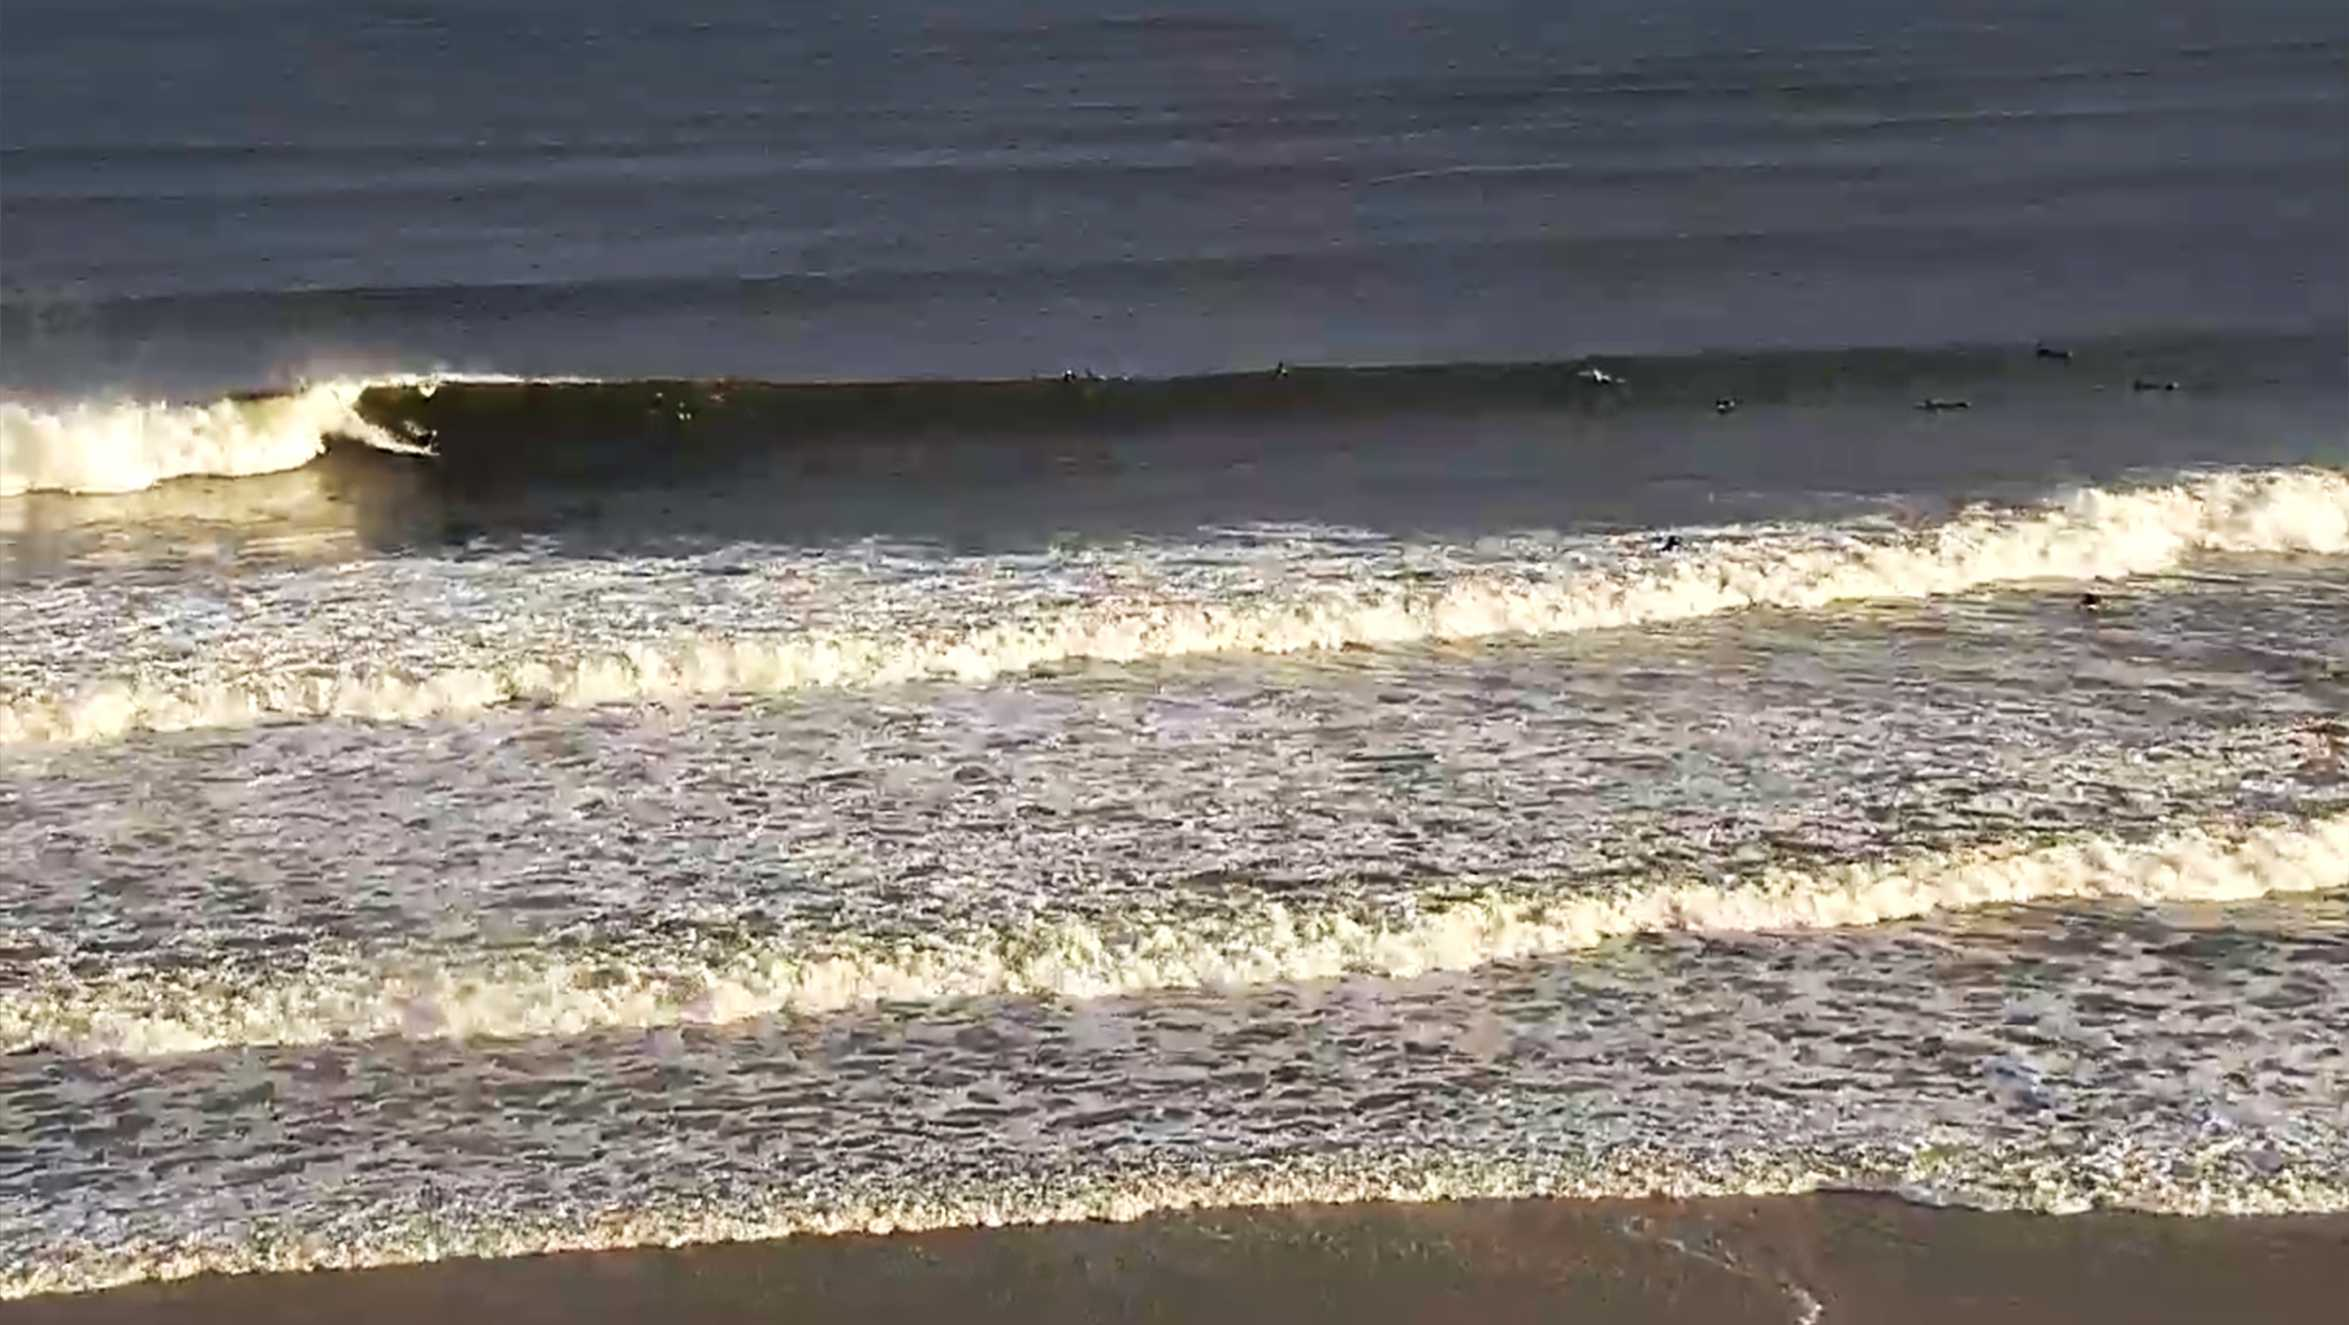 Lido Beach on Long Island / Sept. 5